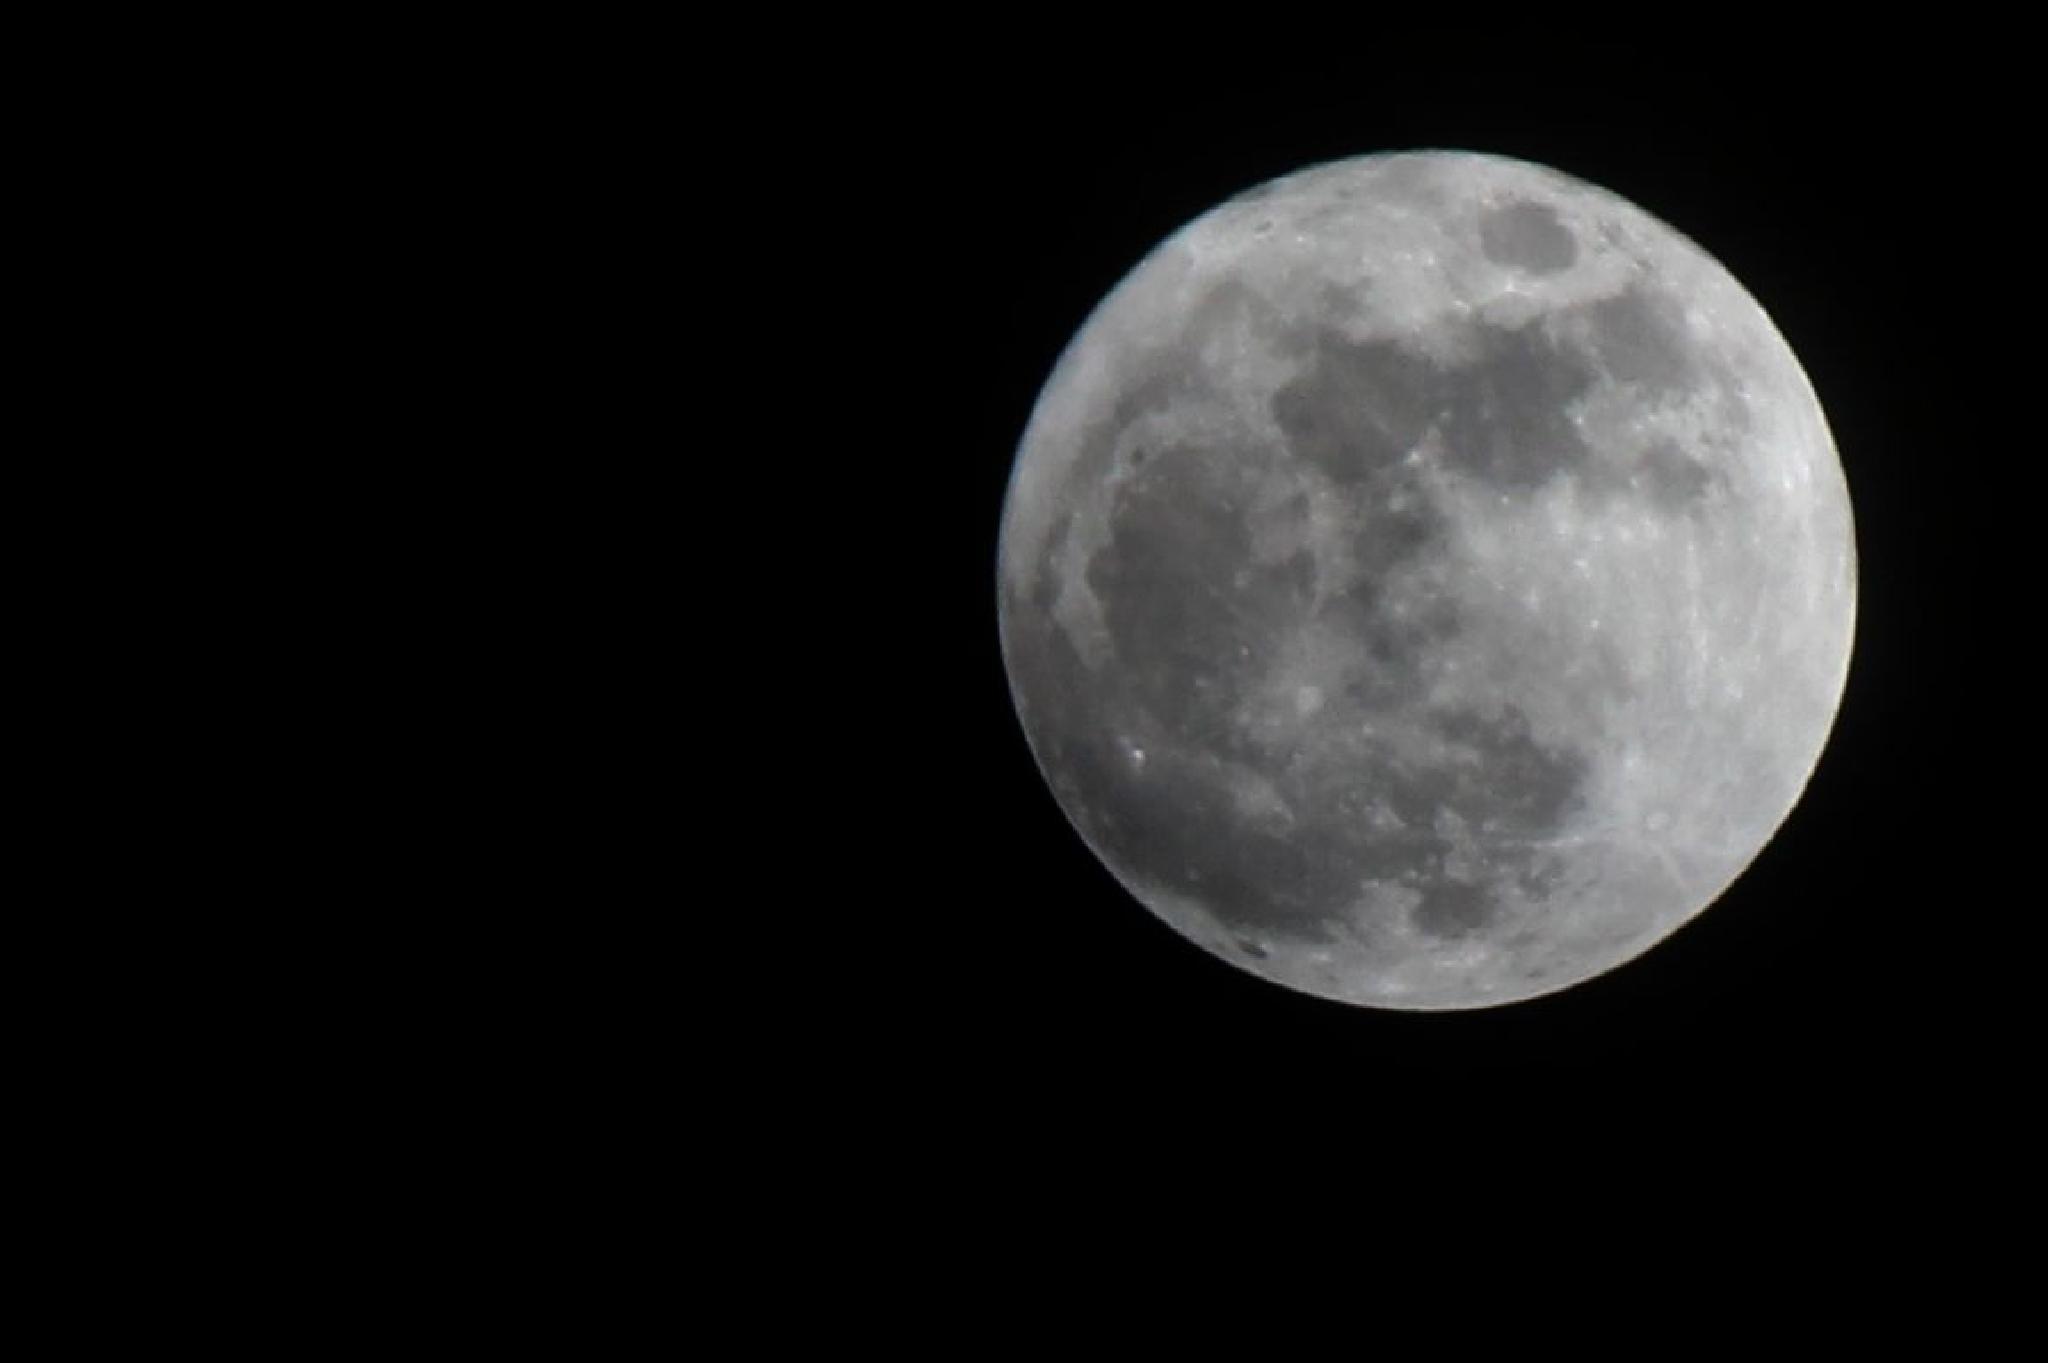 Snow Moon by danlandry69